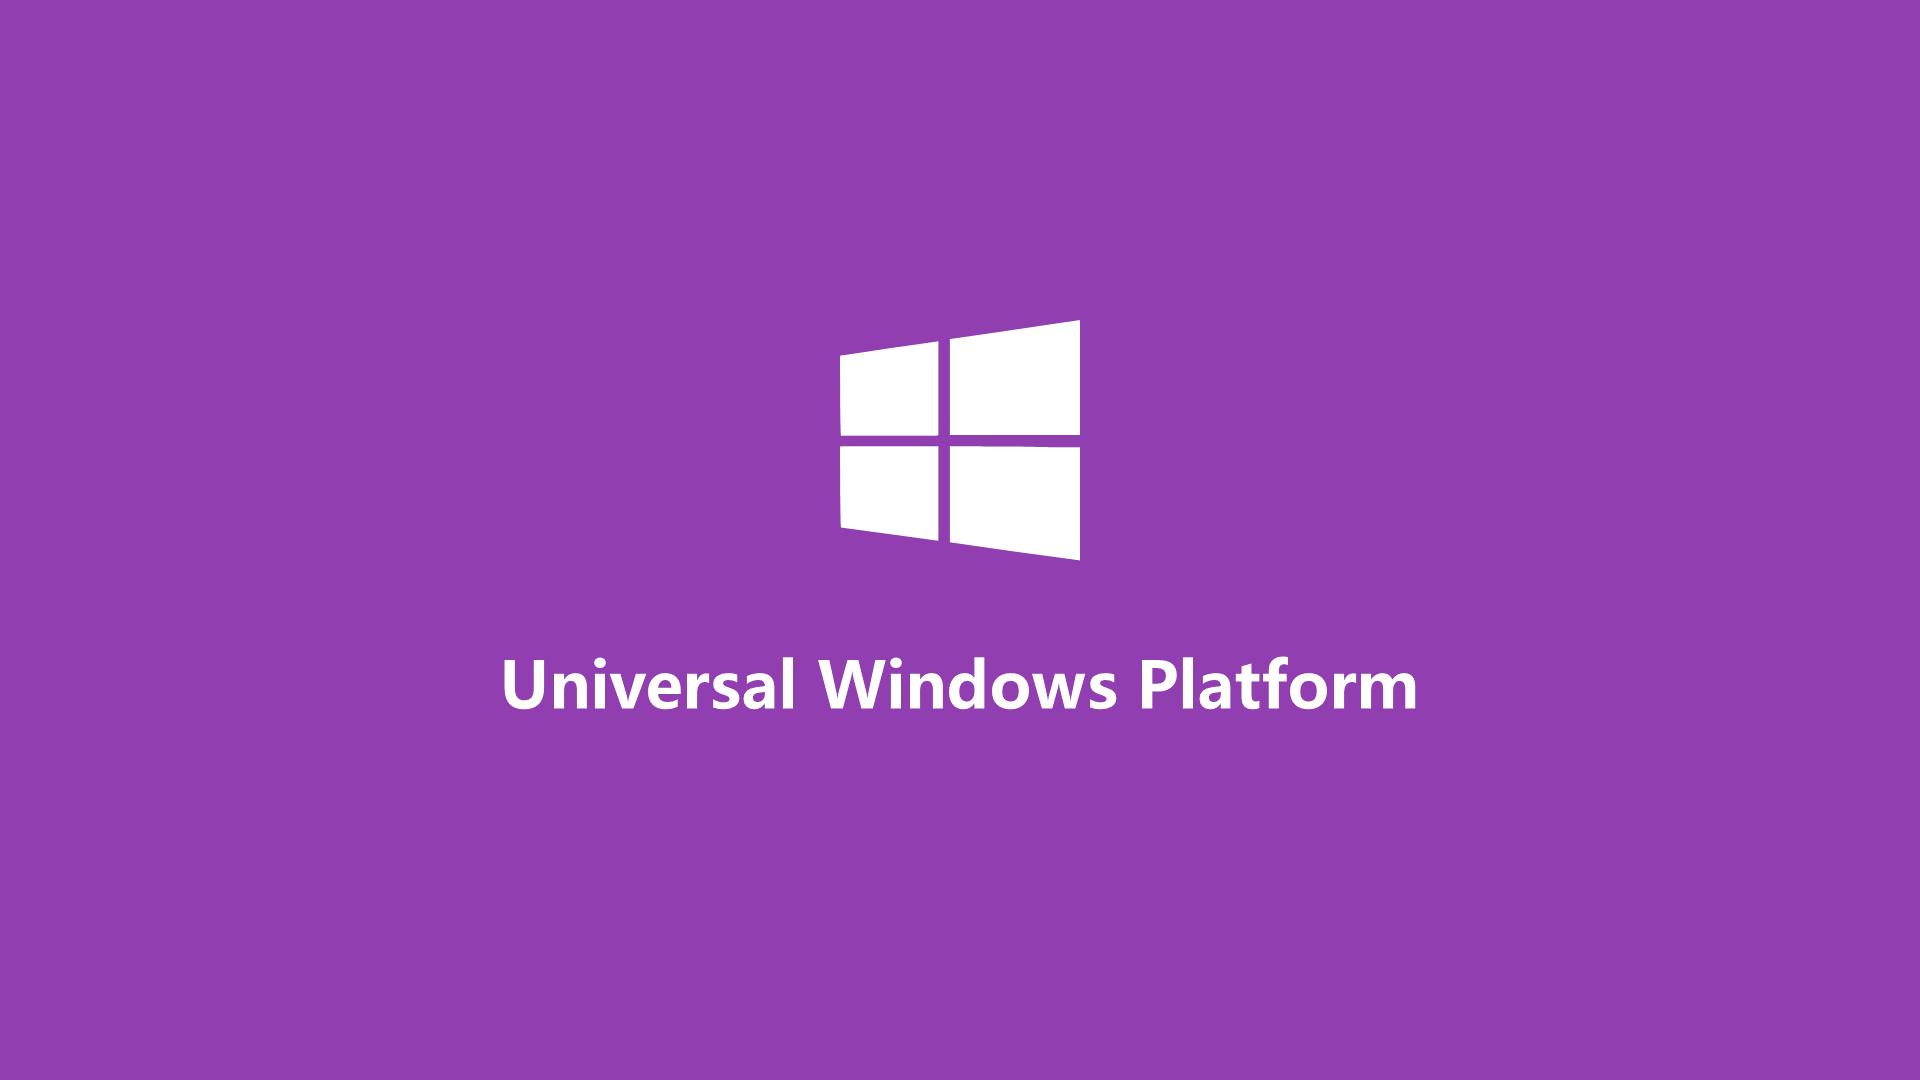 uwp_logo.png